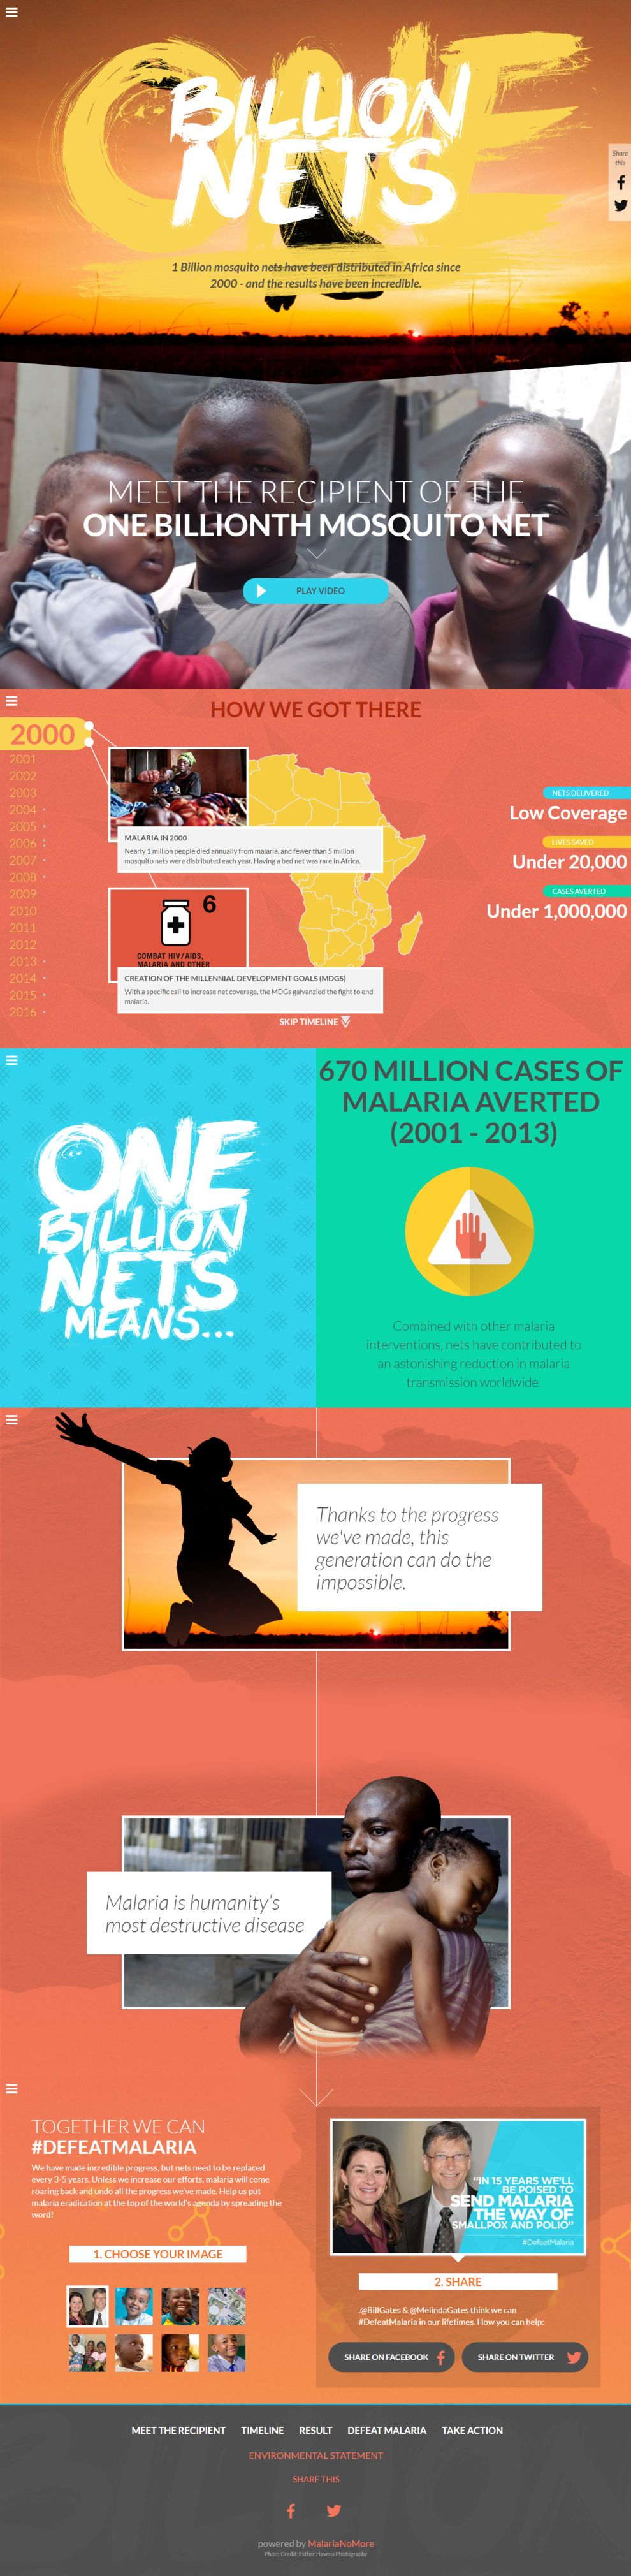 1 Billion Nets Colorful Website Design